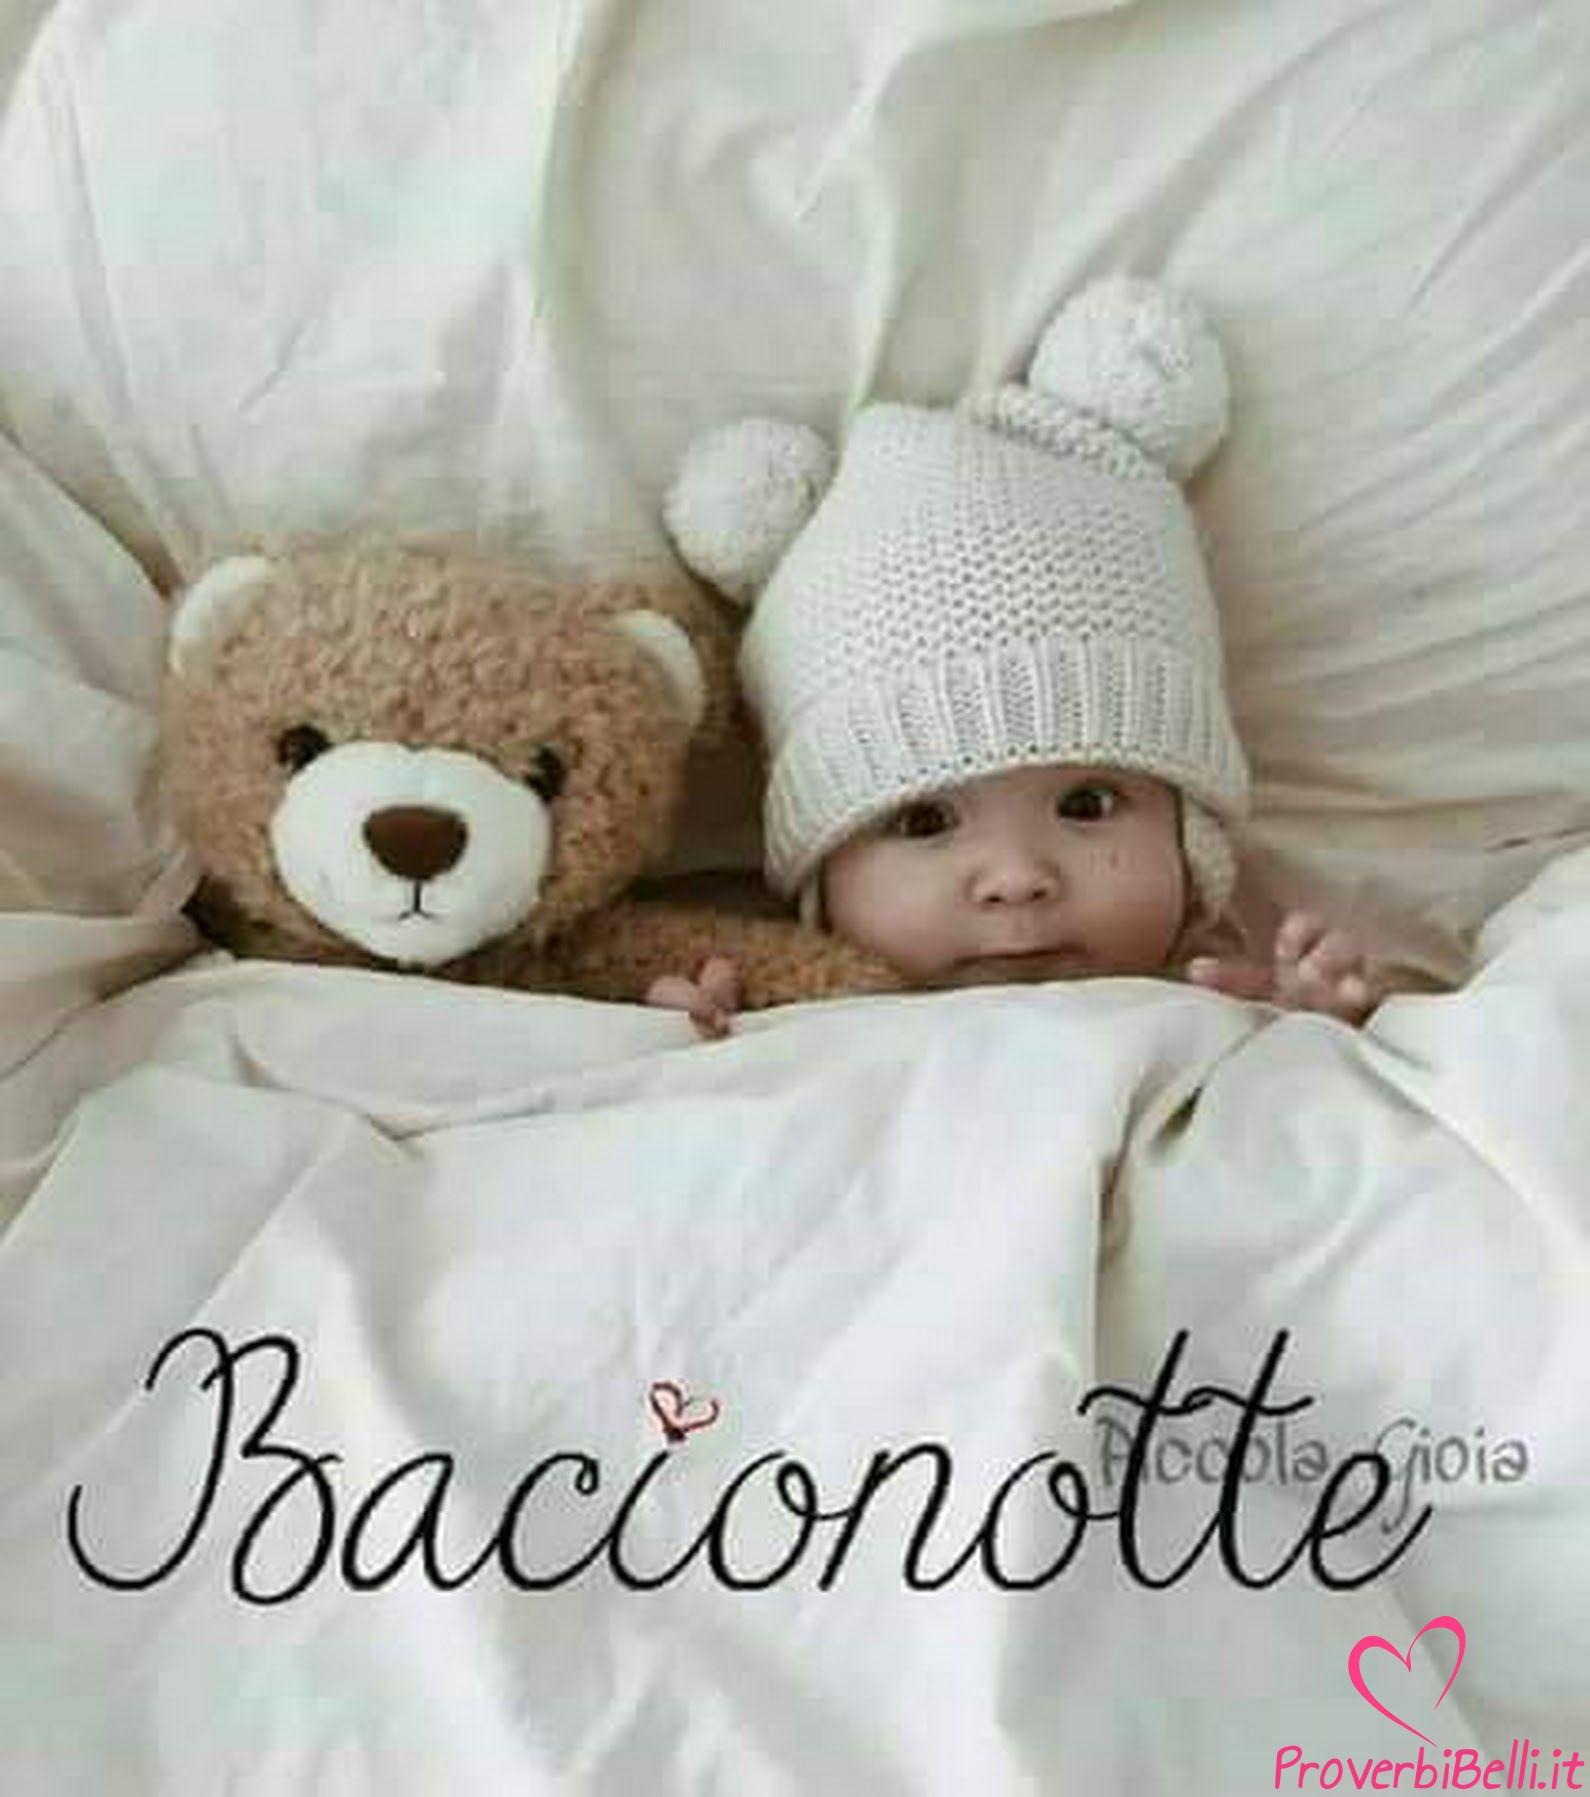 Buonanotte-1